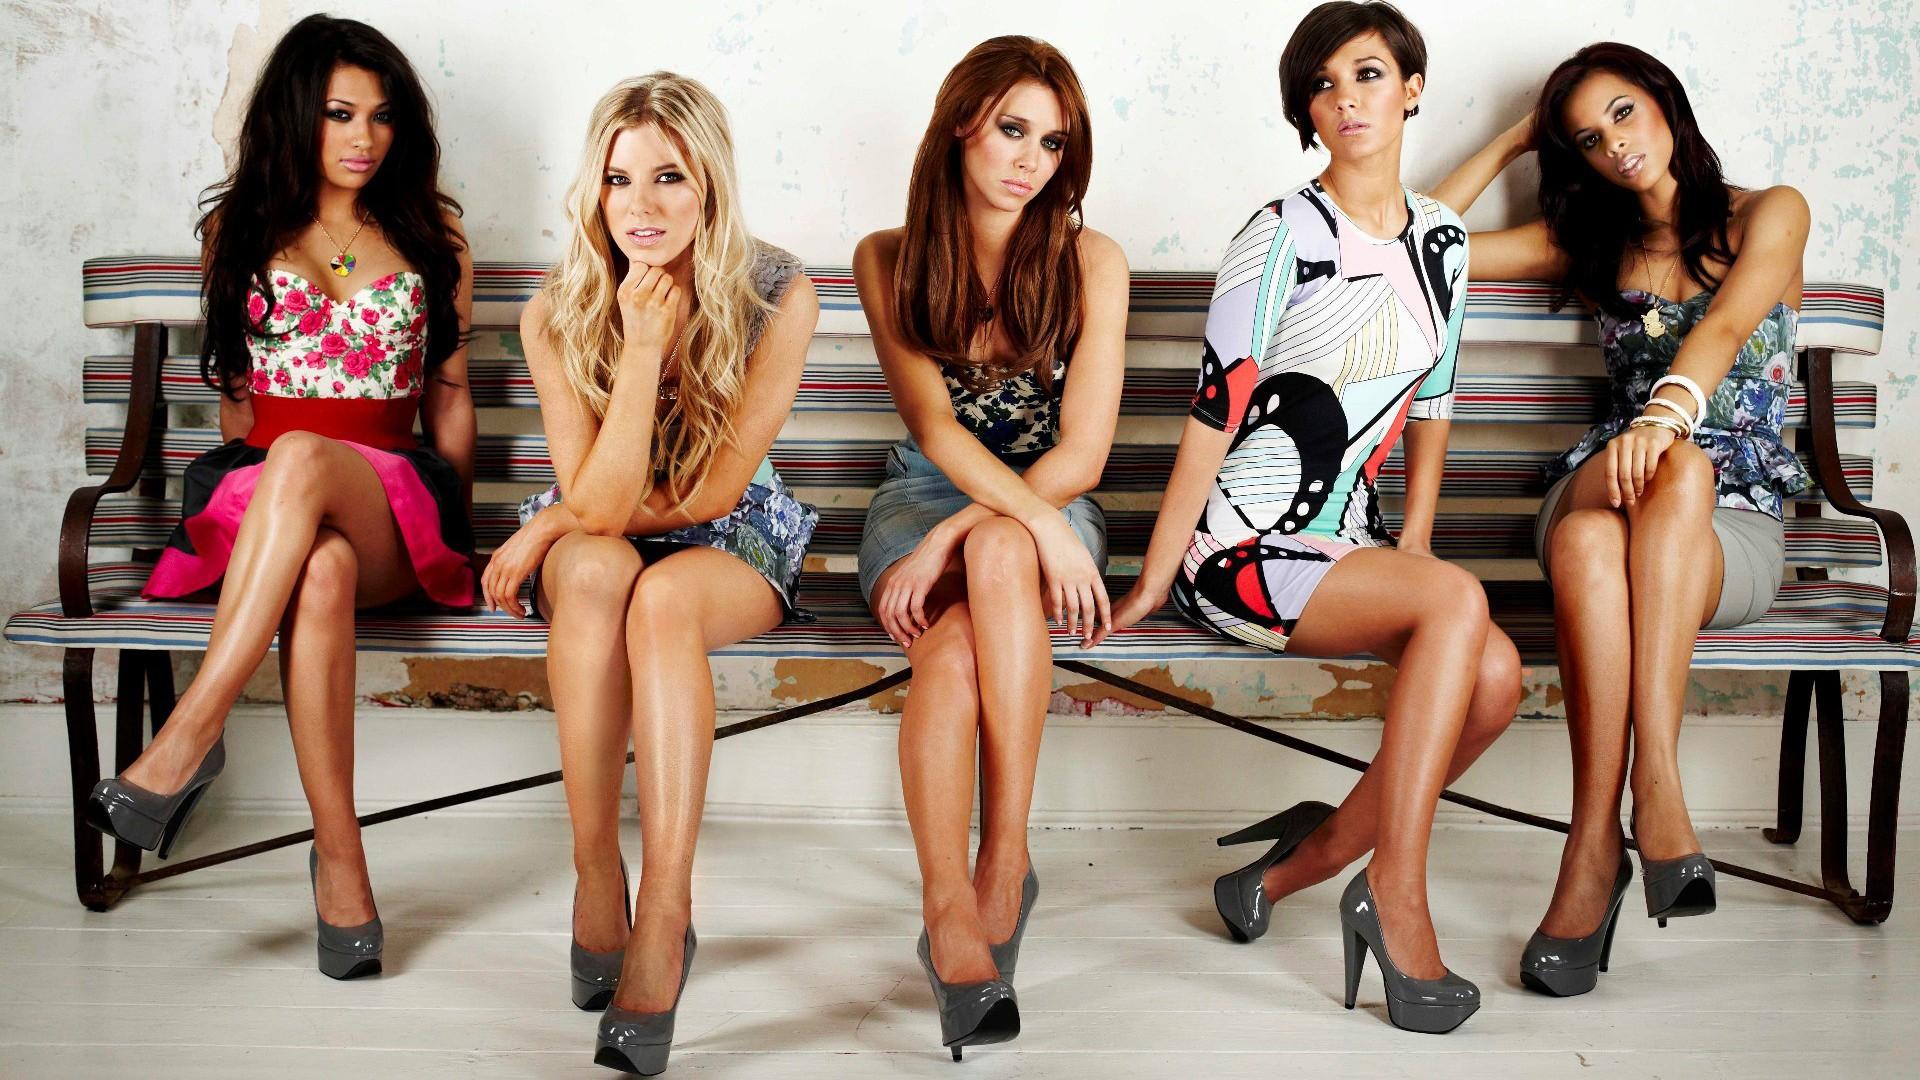 leggy women in group